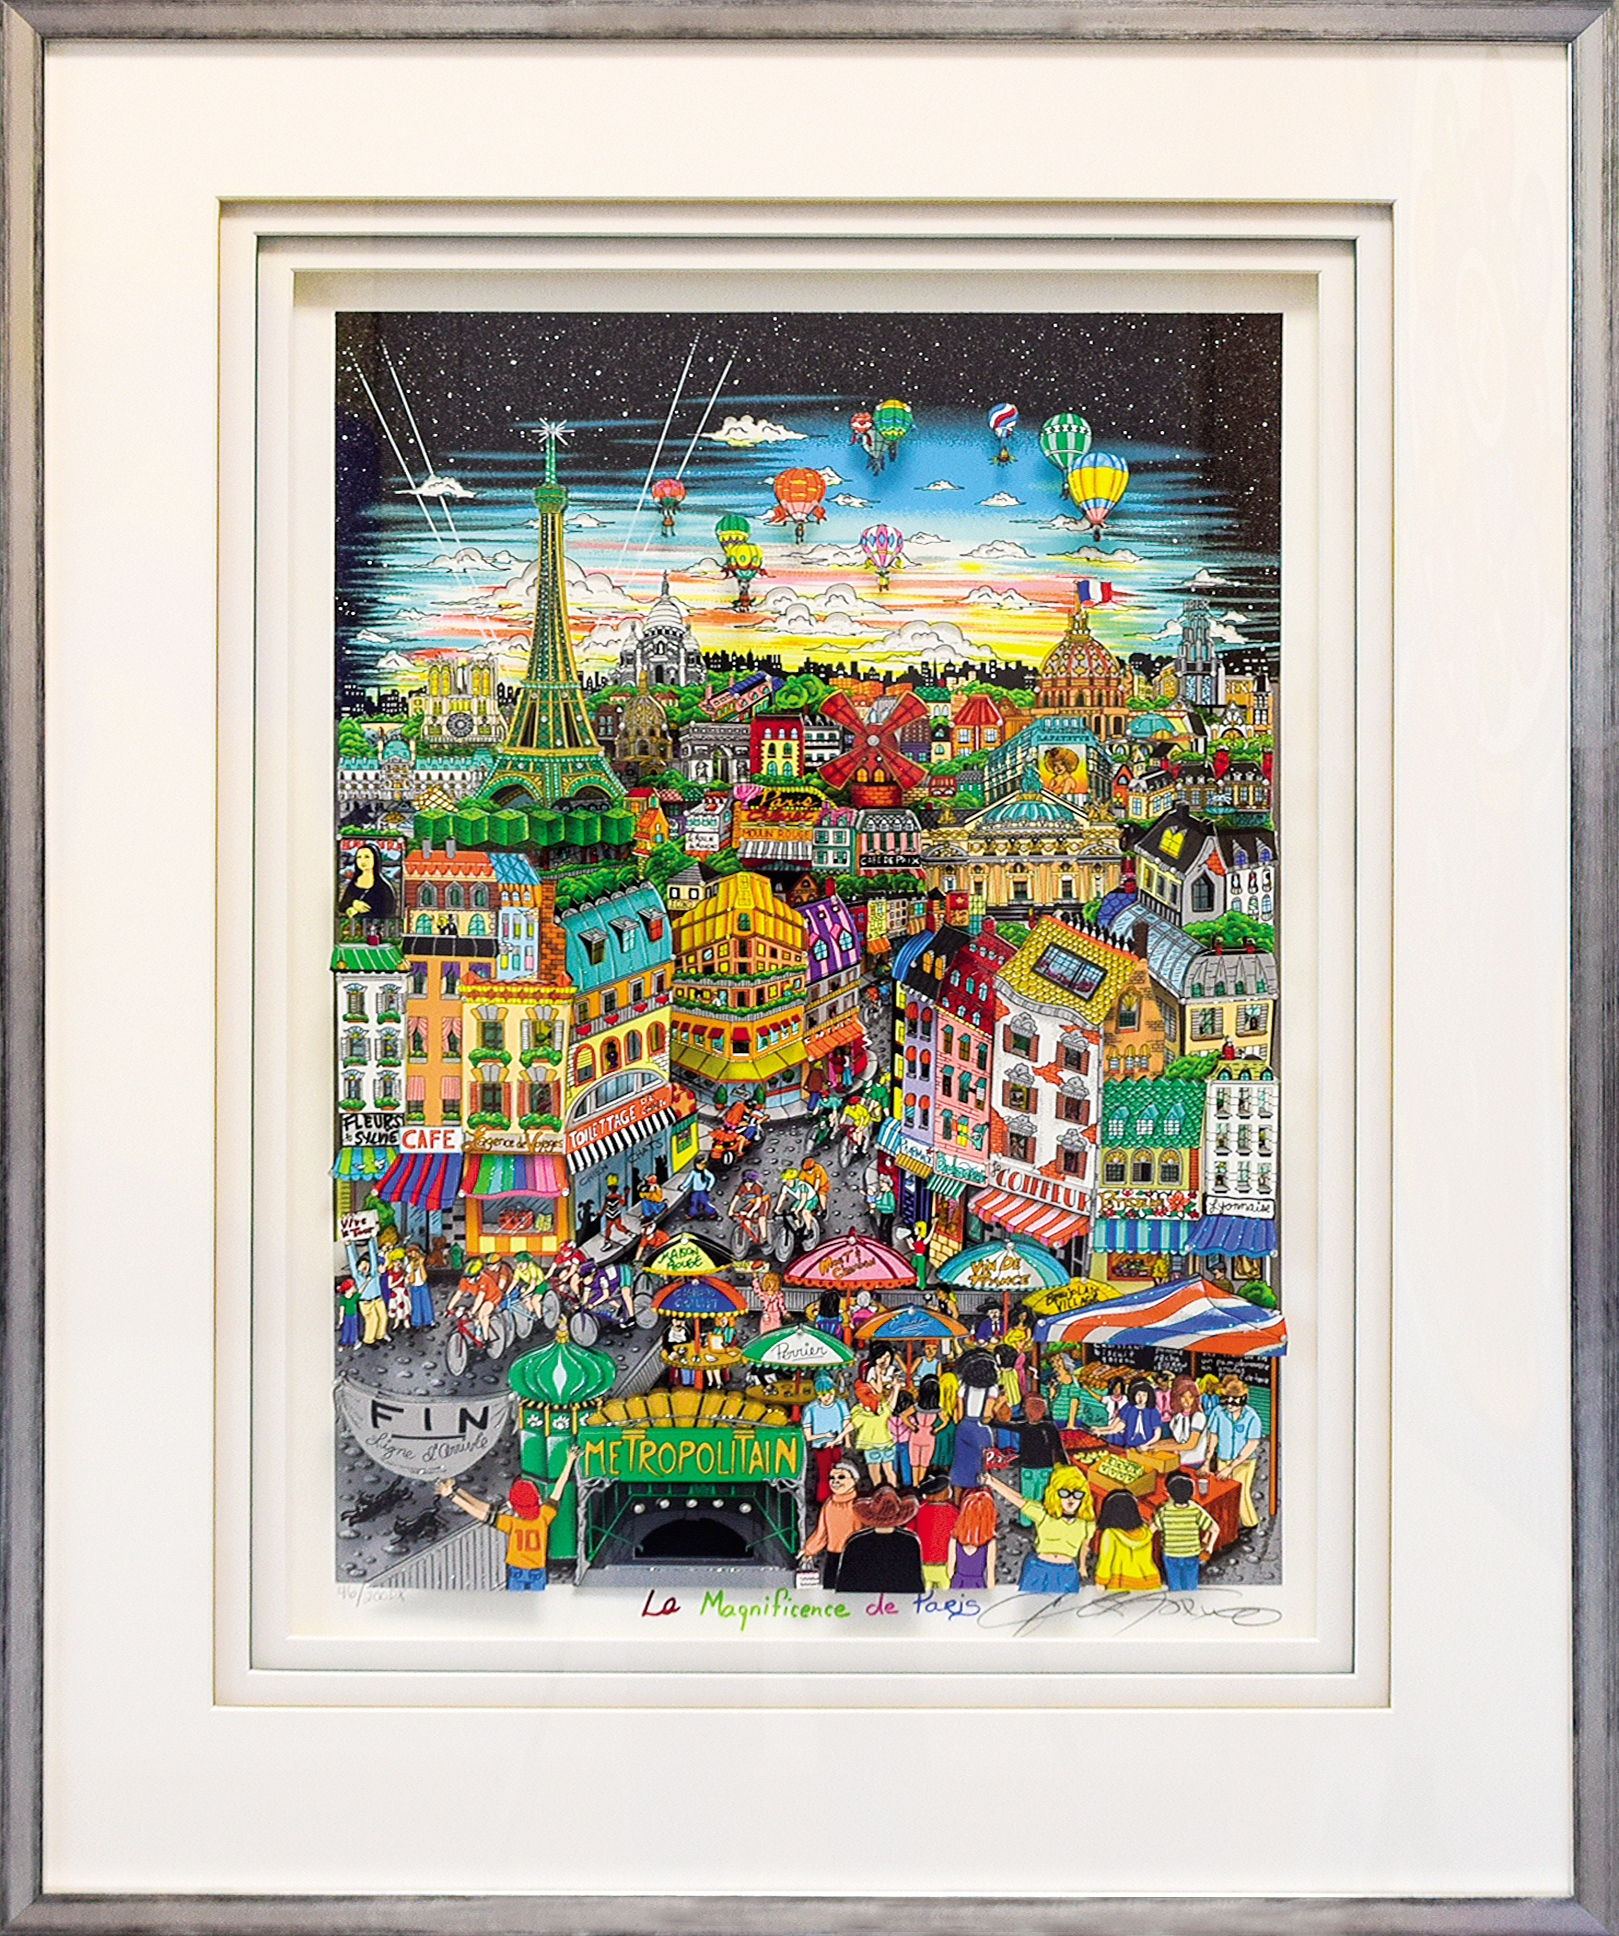 Charles Fazzino - La Magnificence de Paris , 5553-008-328-988-995